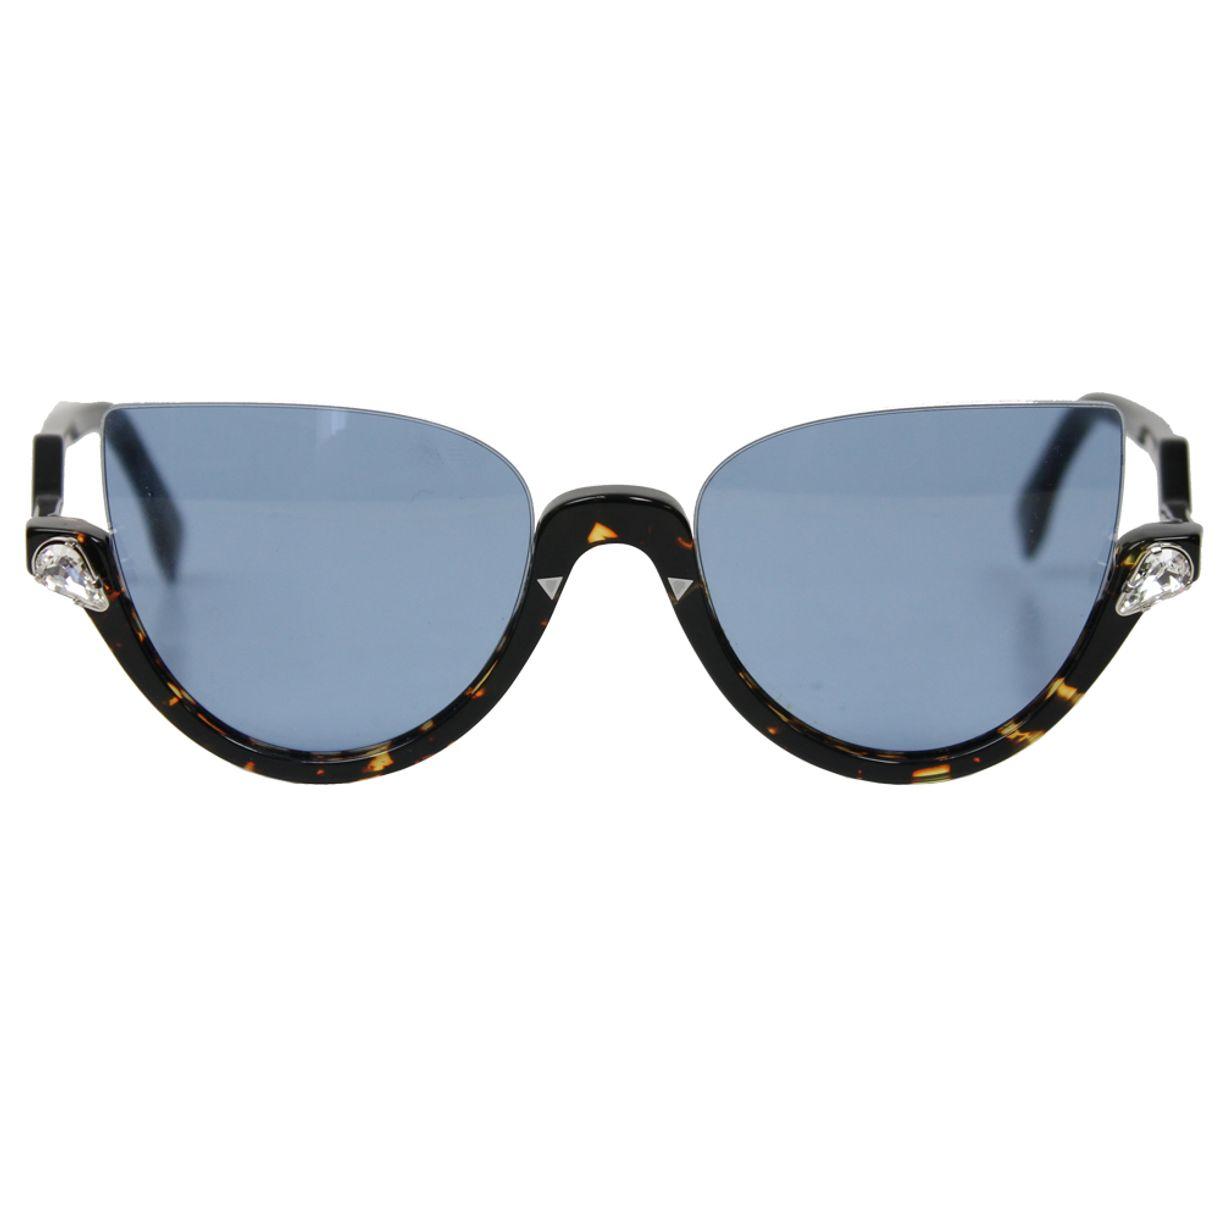 oculosfendifrente